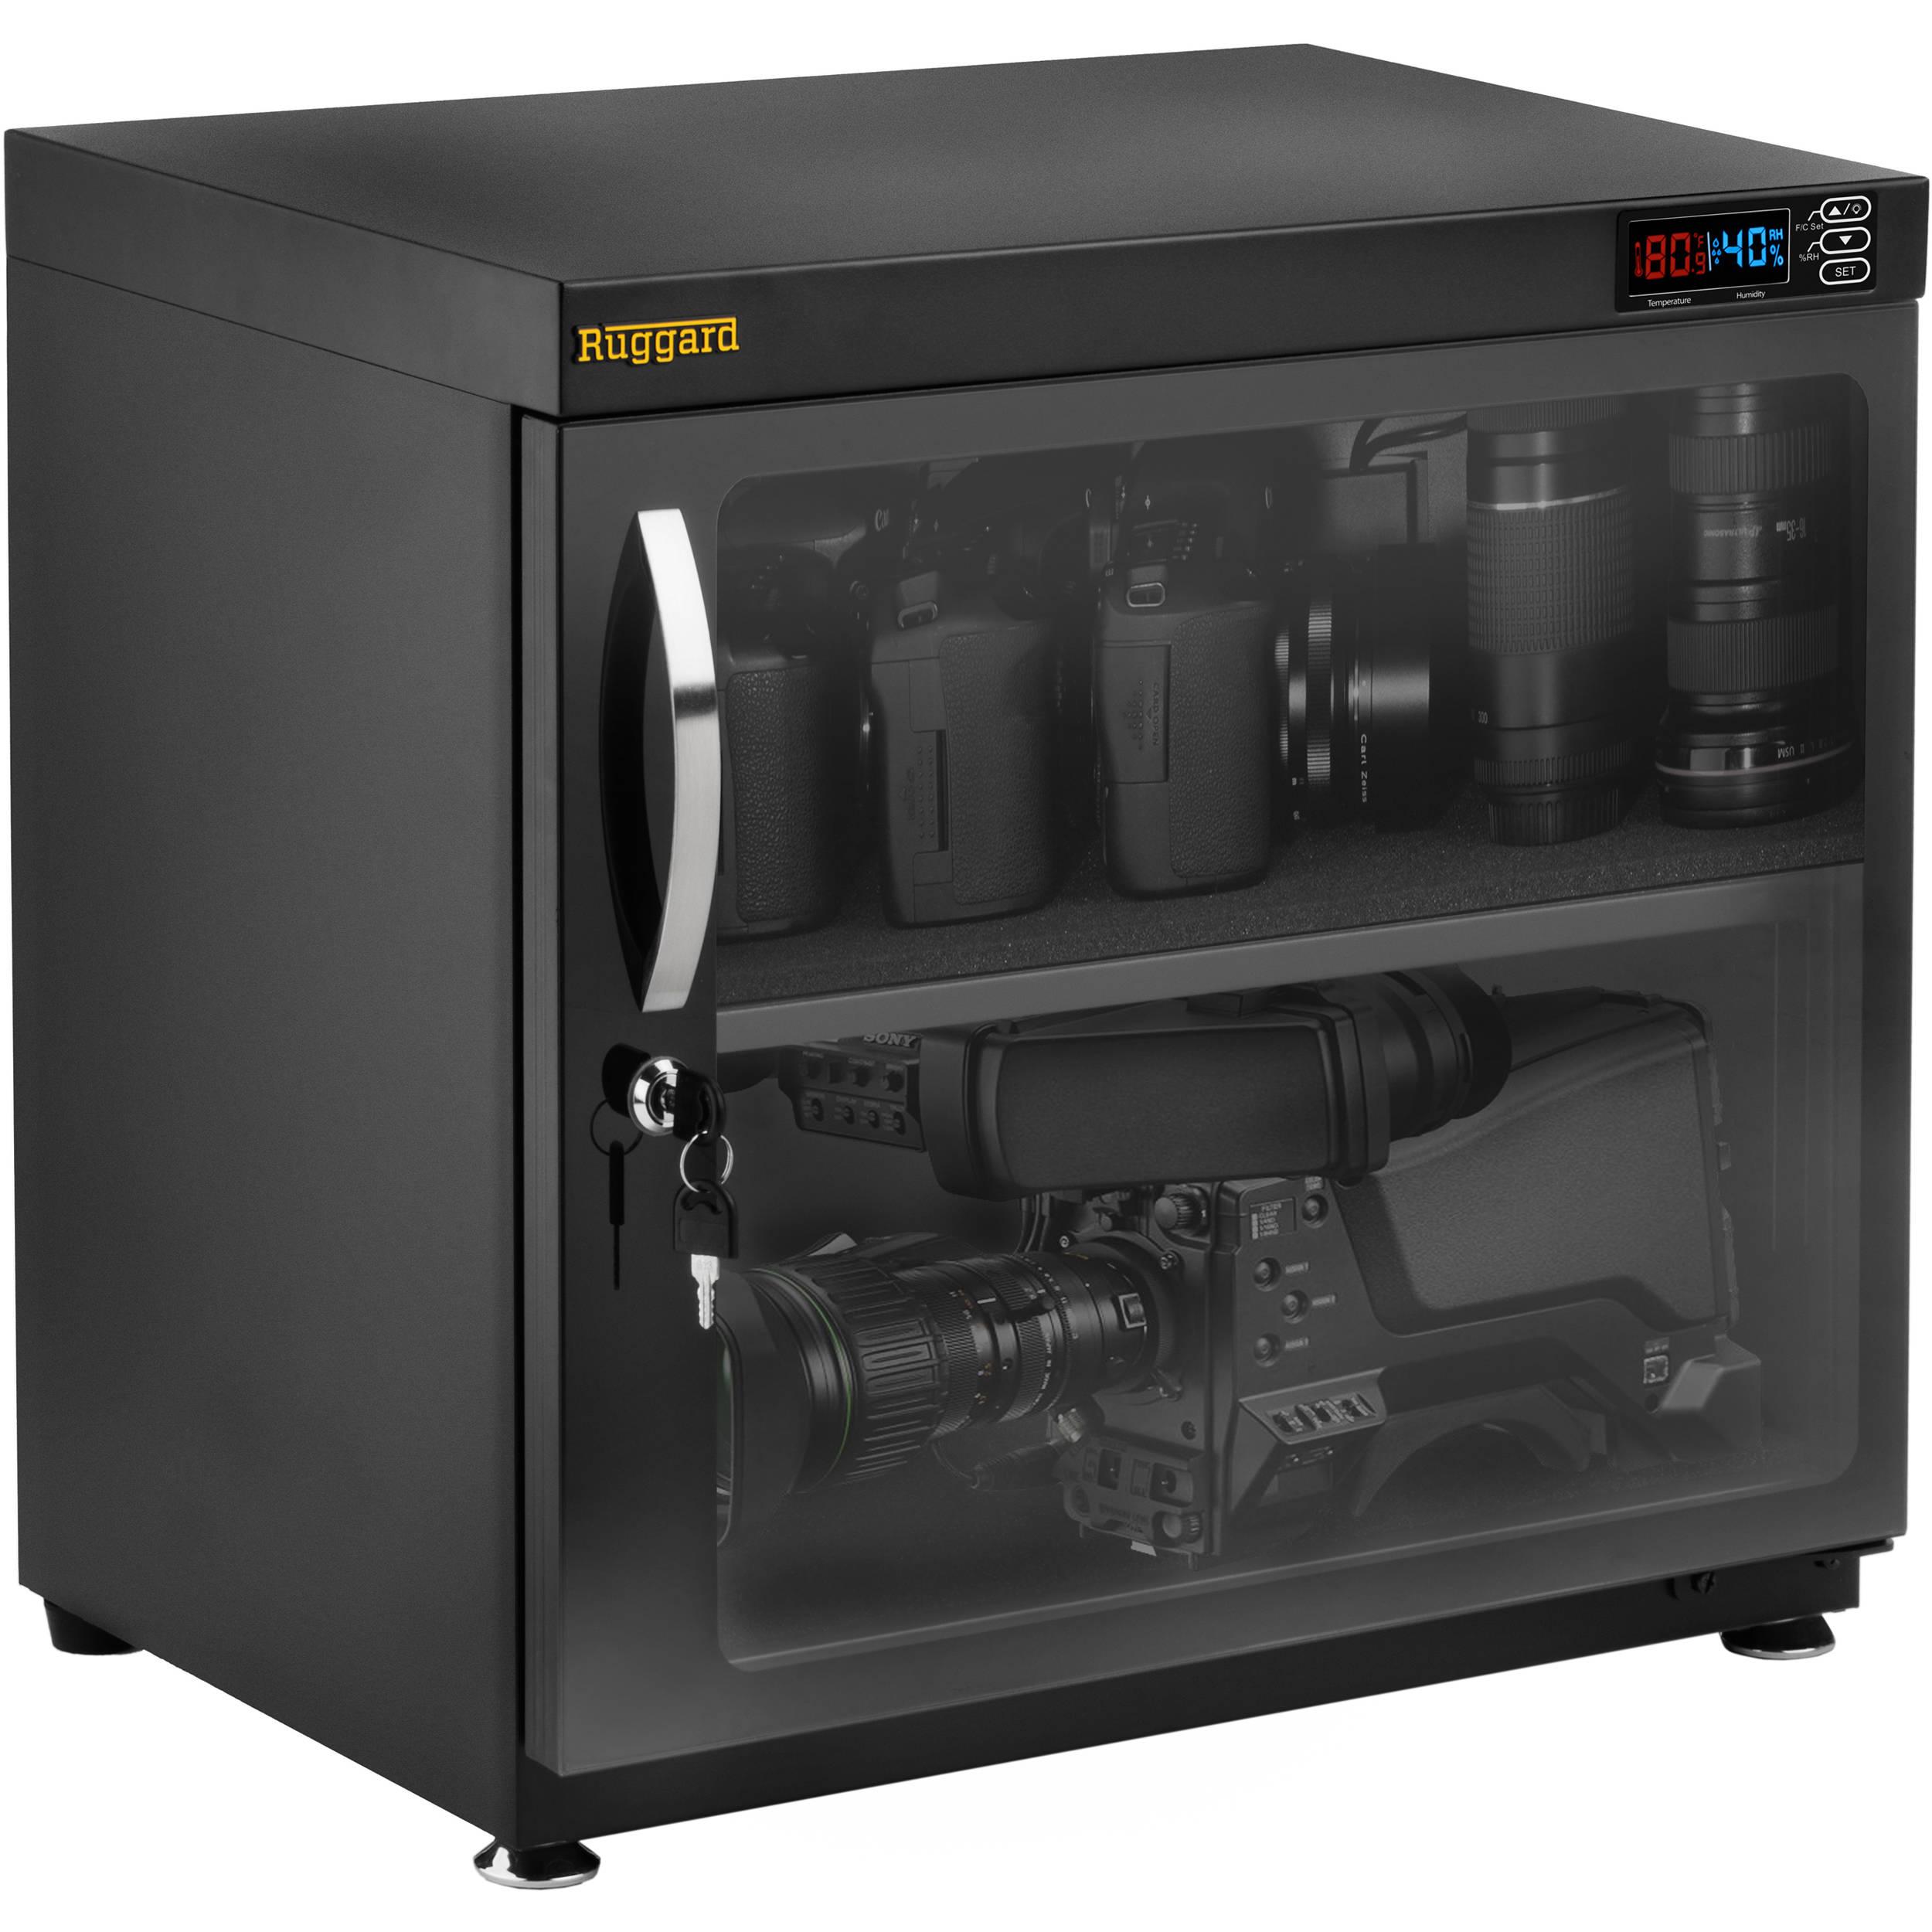 ruggard electronic dry cabinet (80l) edc-80l b&h photo video